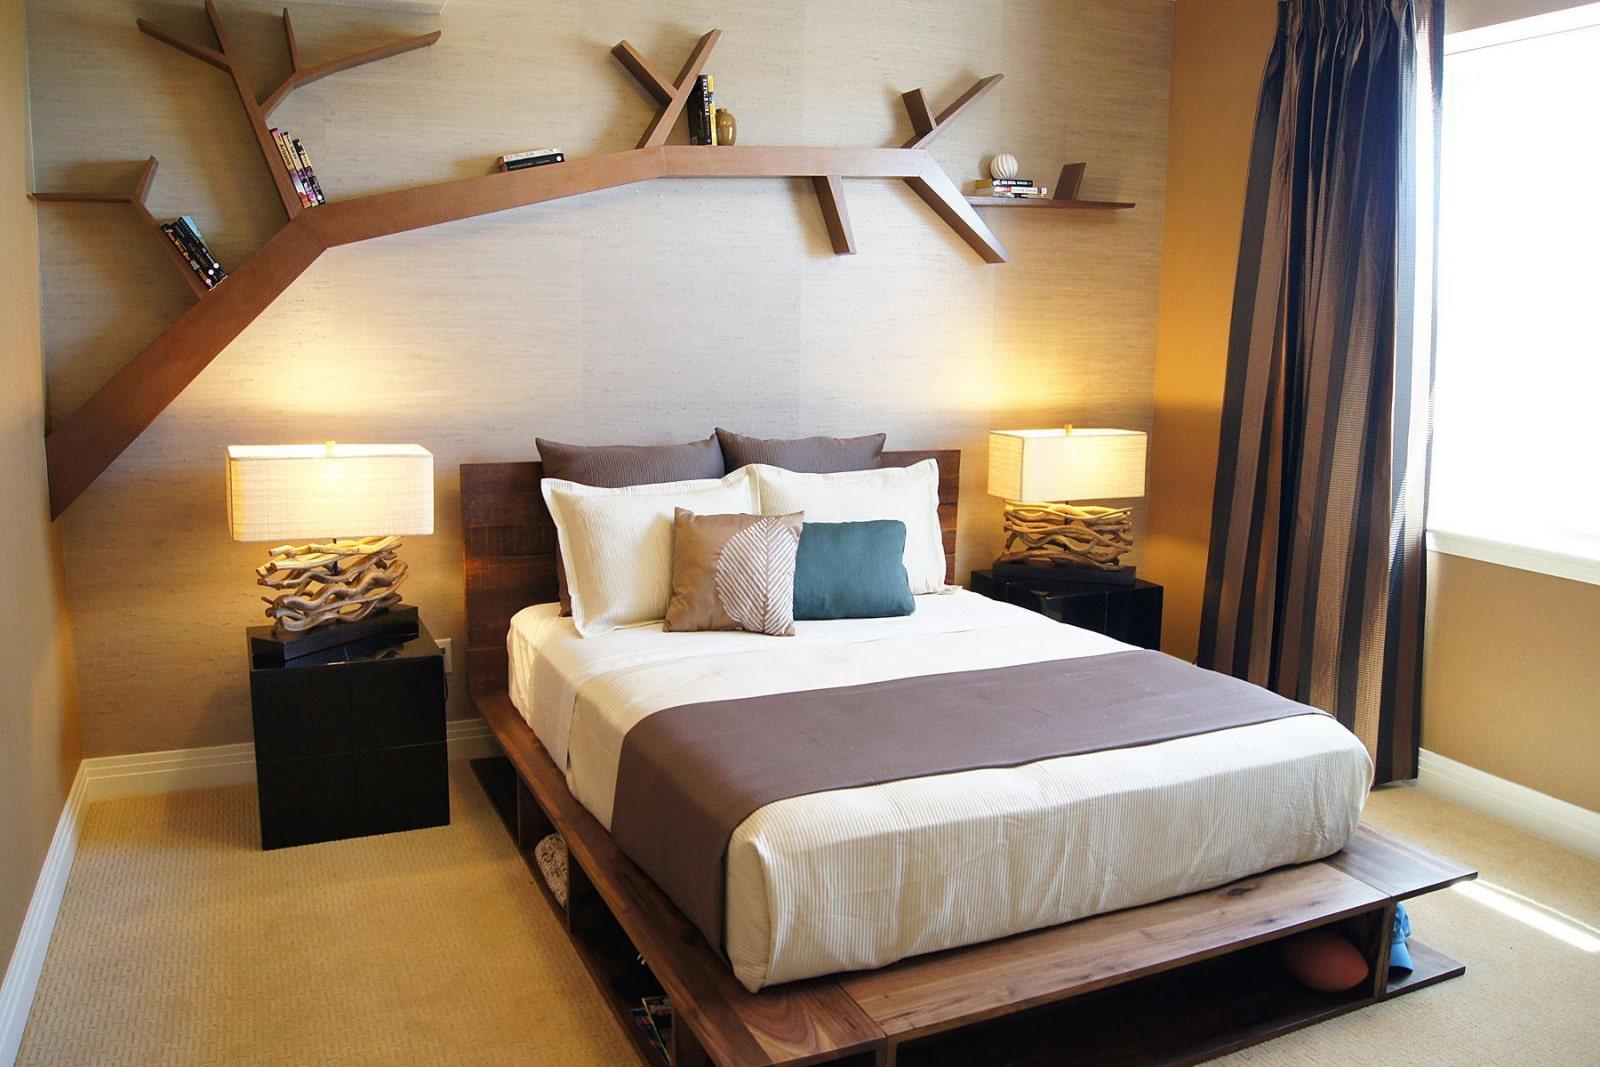 полки для спальни